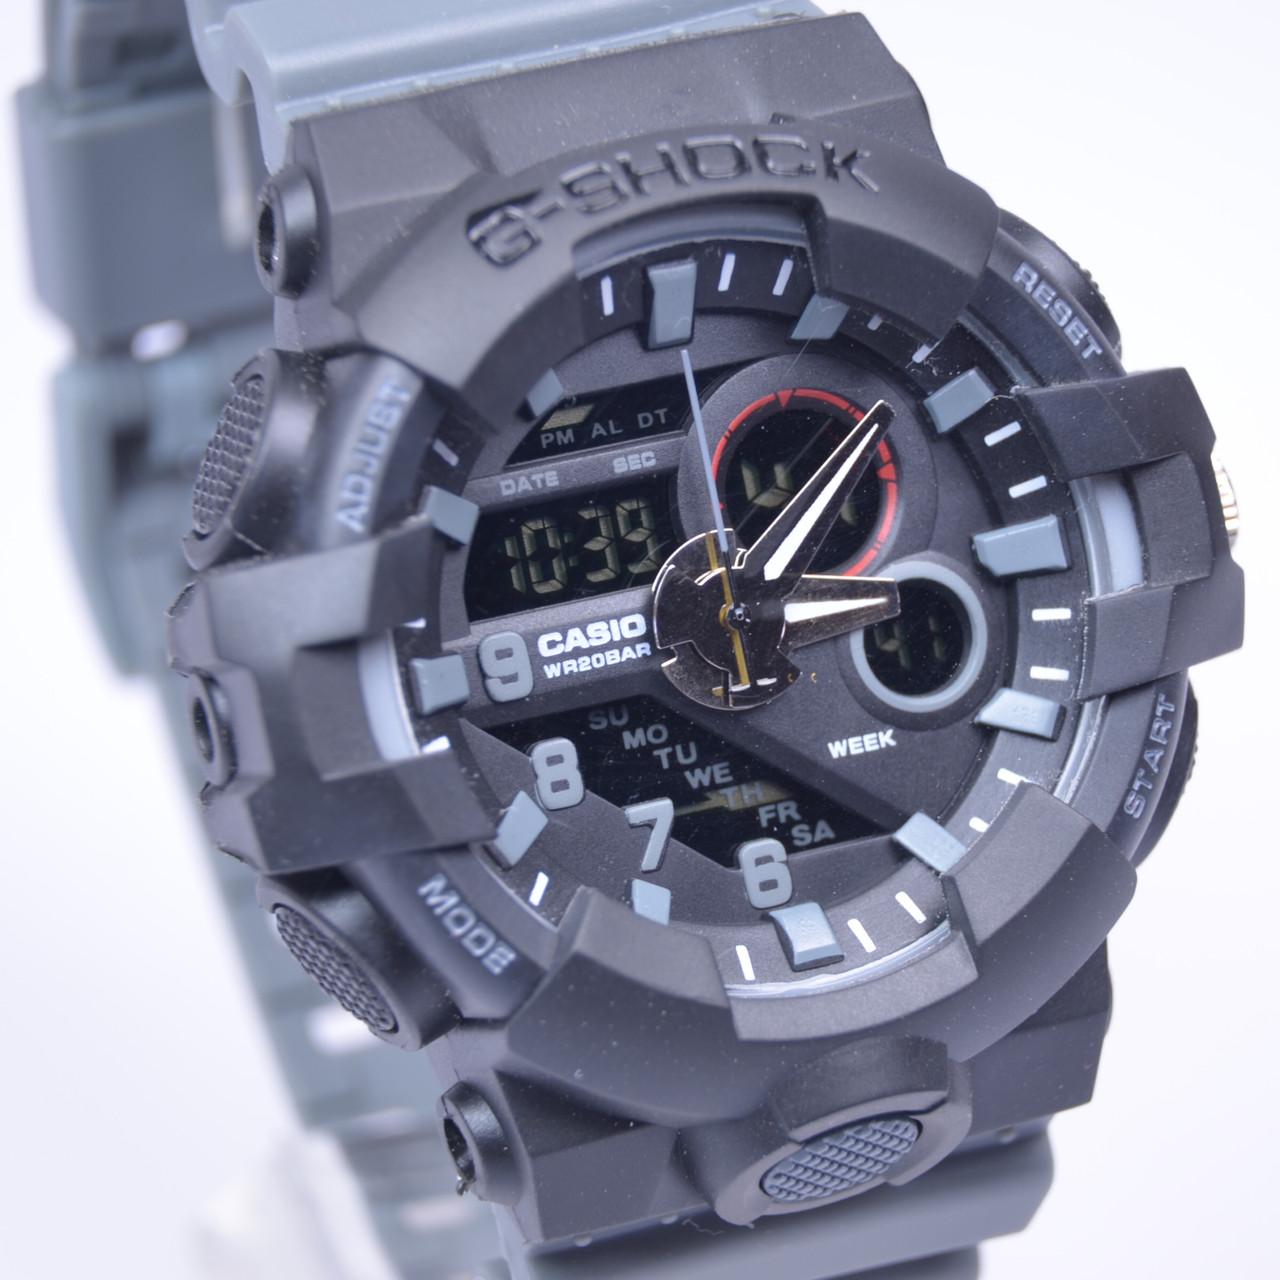 Часы наручные типа g shock самые дорогие часы наручные ссср